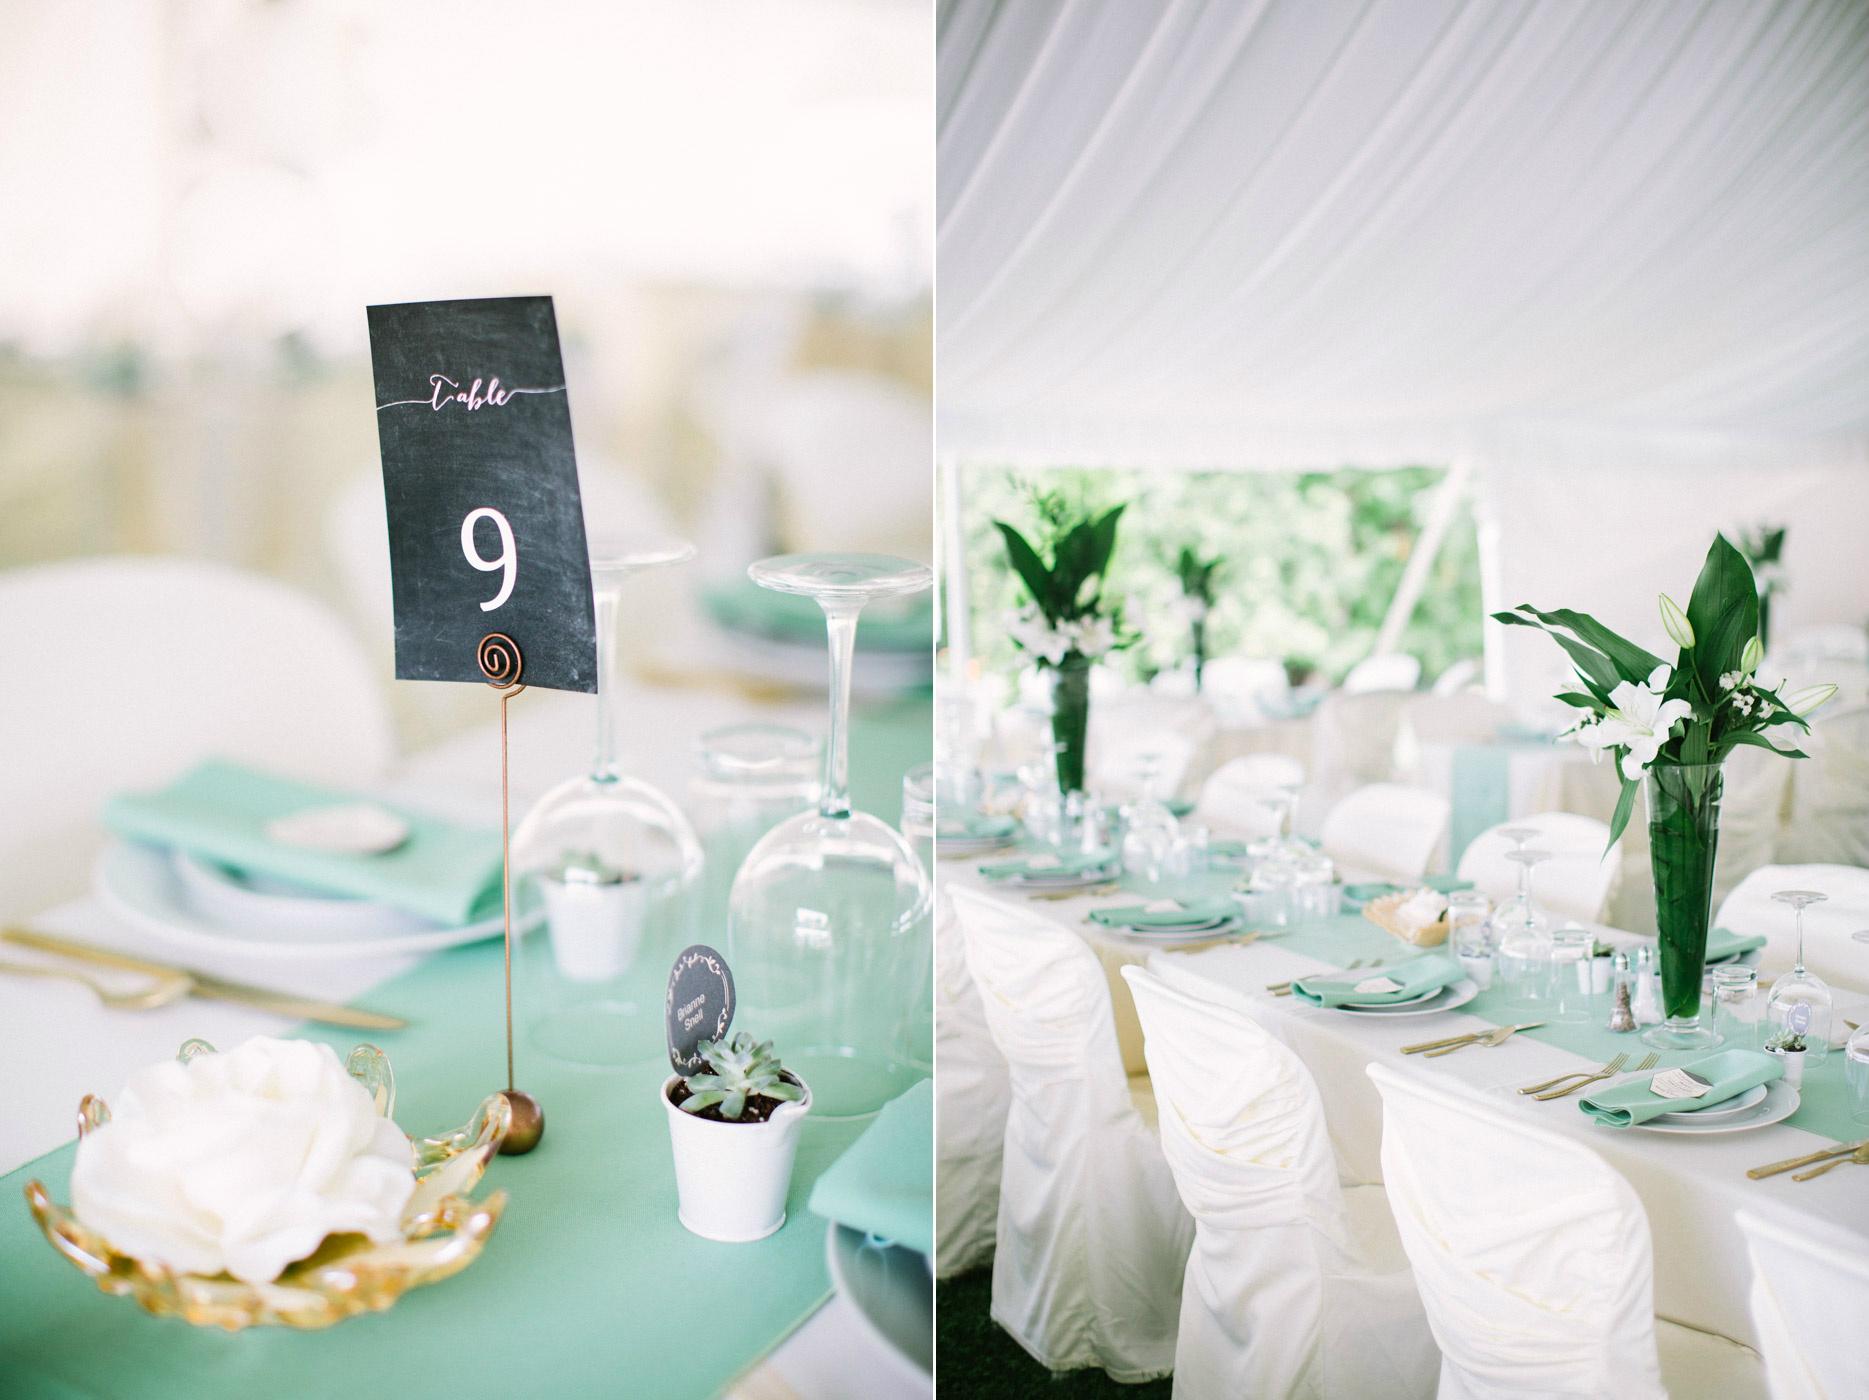 Backyard_collingwood_waterfront_diy_wedding2.jpg